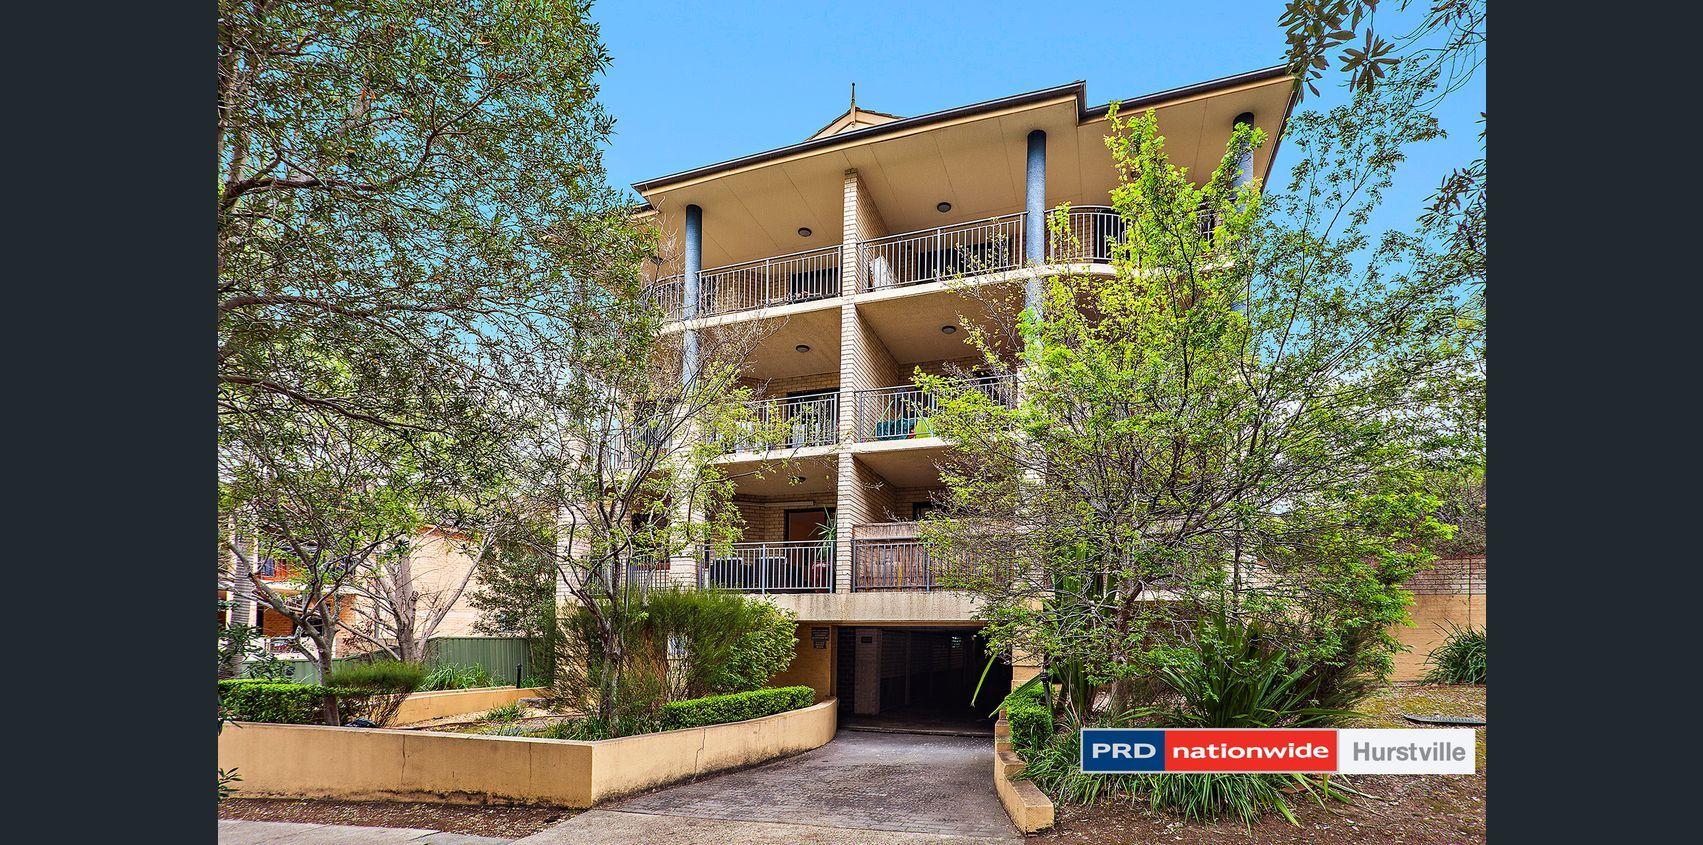 1/1-3 St Georges Pde, Hurstville NSW 2220, Image 0